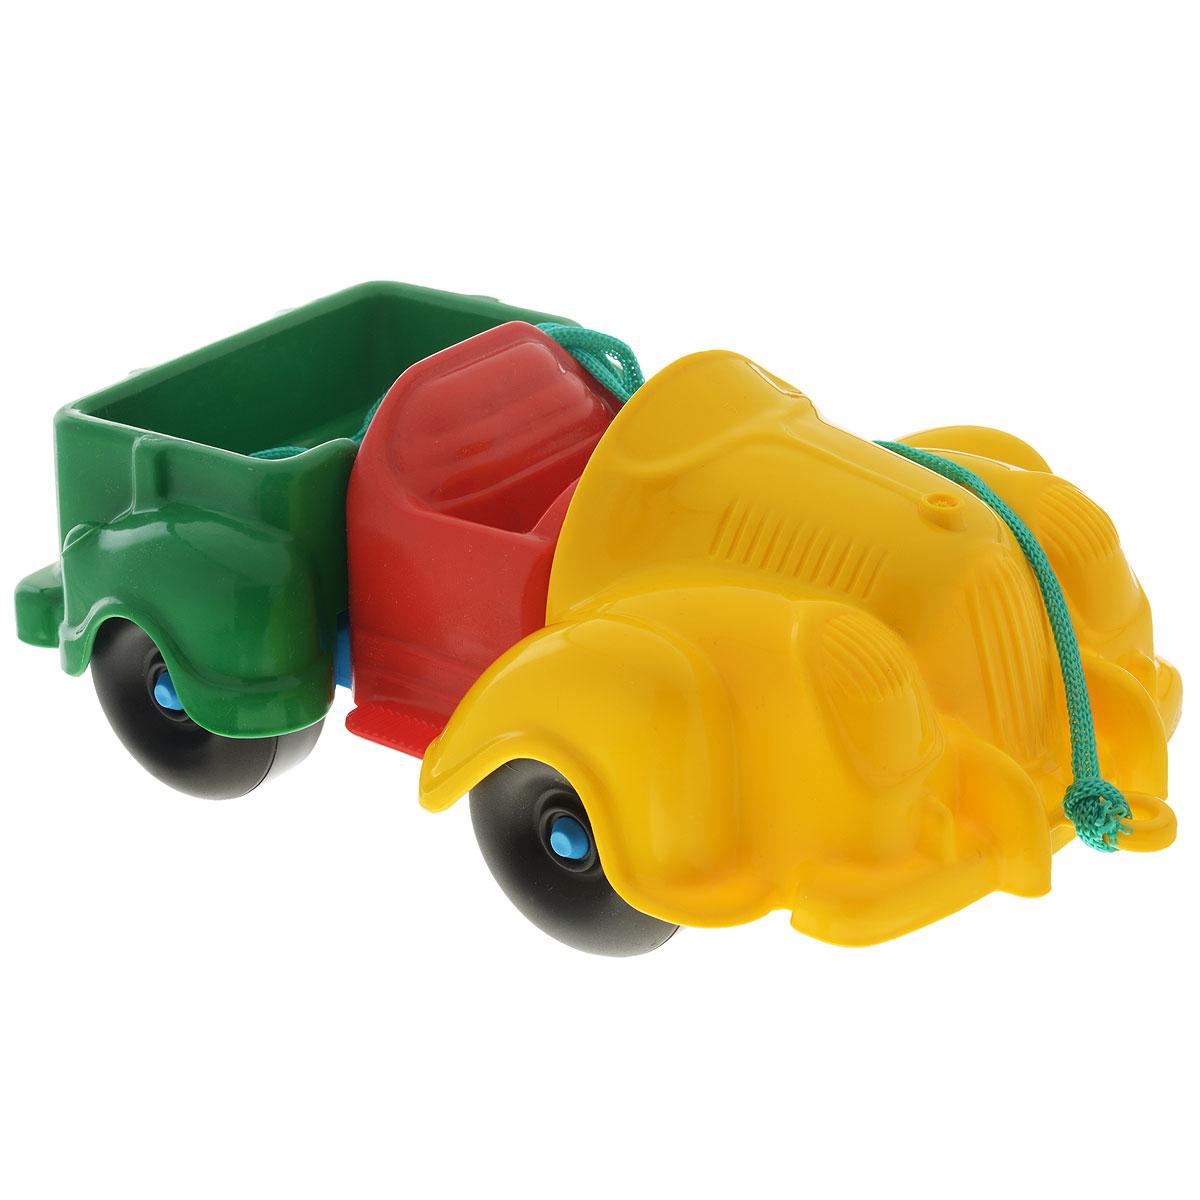 Каталка-конструктор Bauer Грузовик bauer toys игрушка каталка самолет